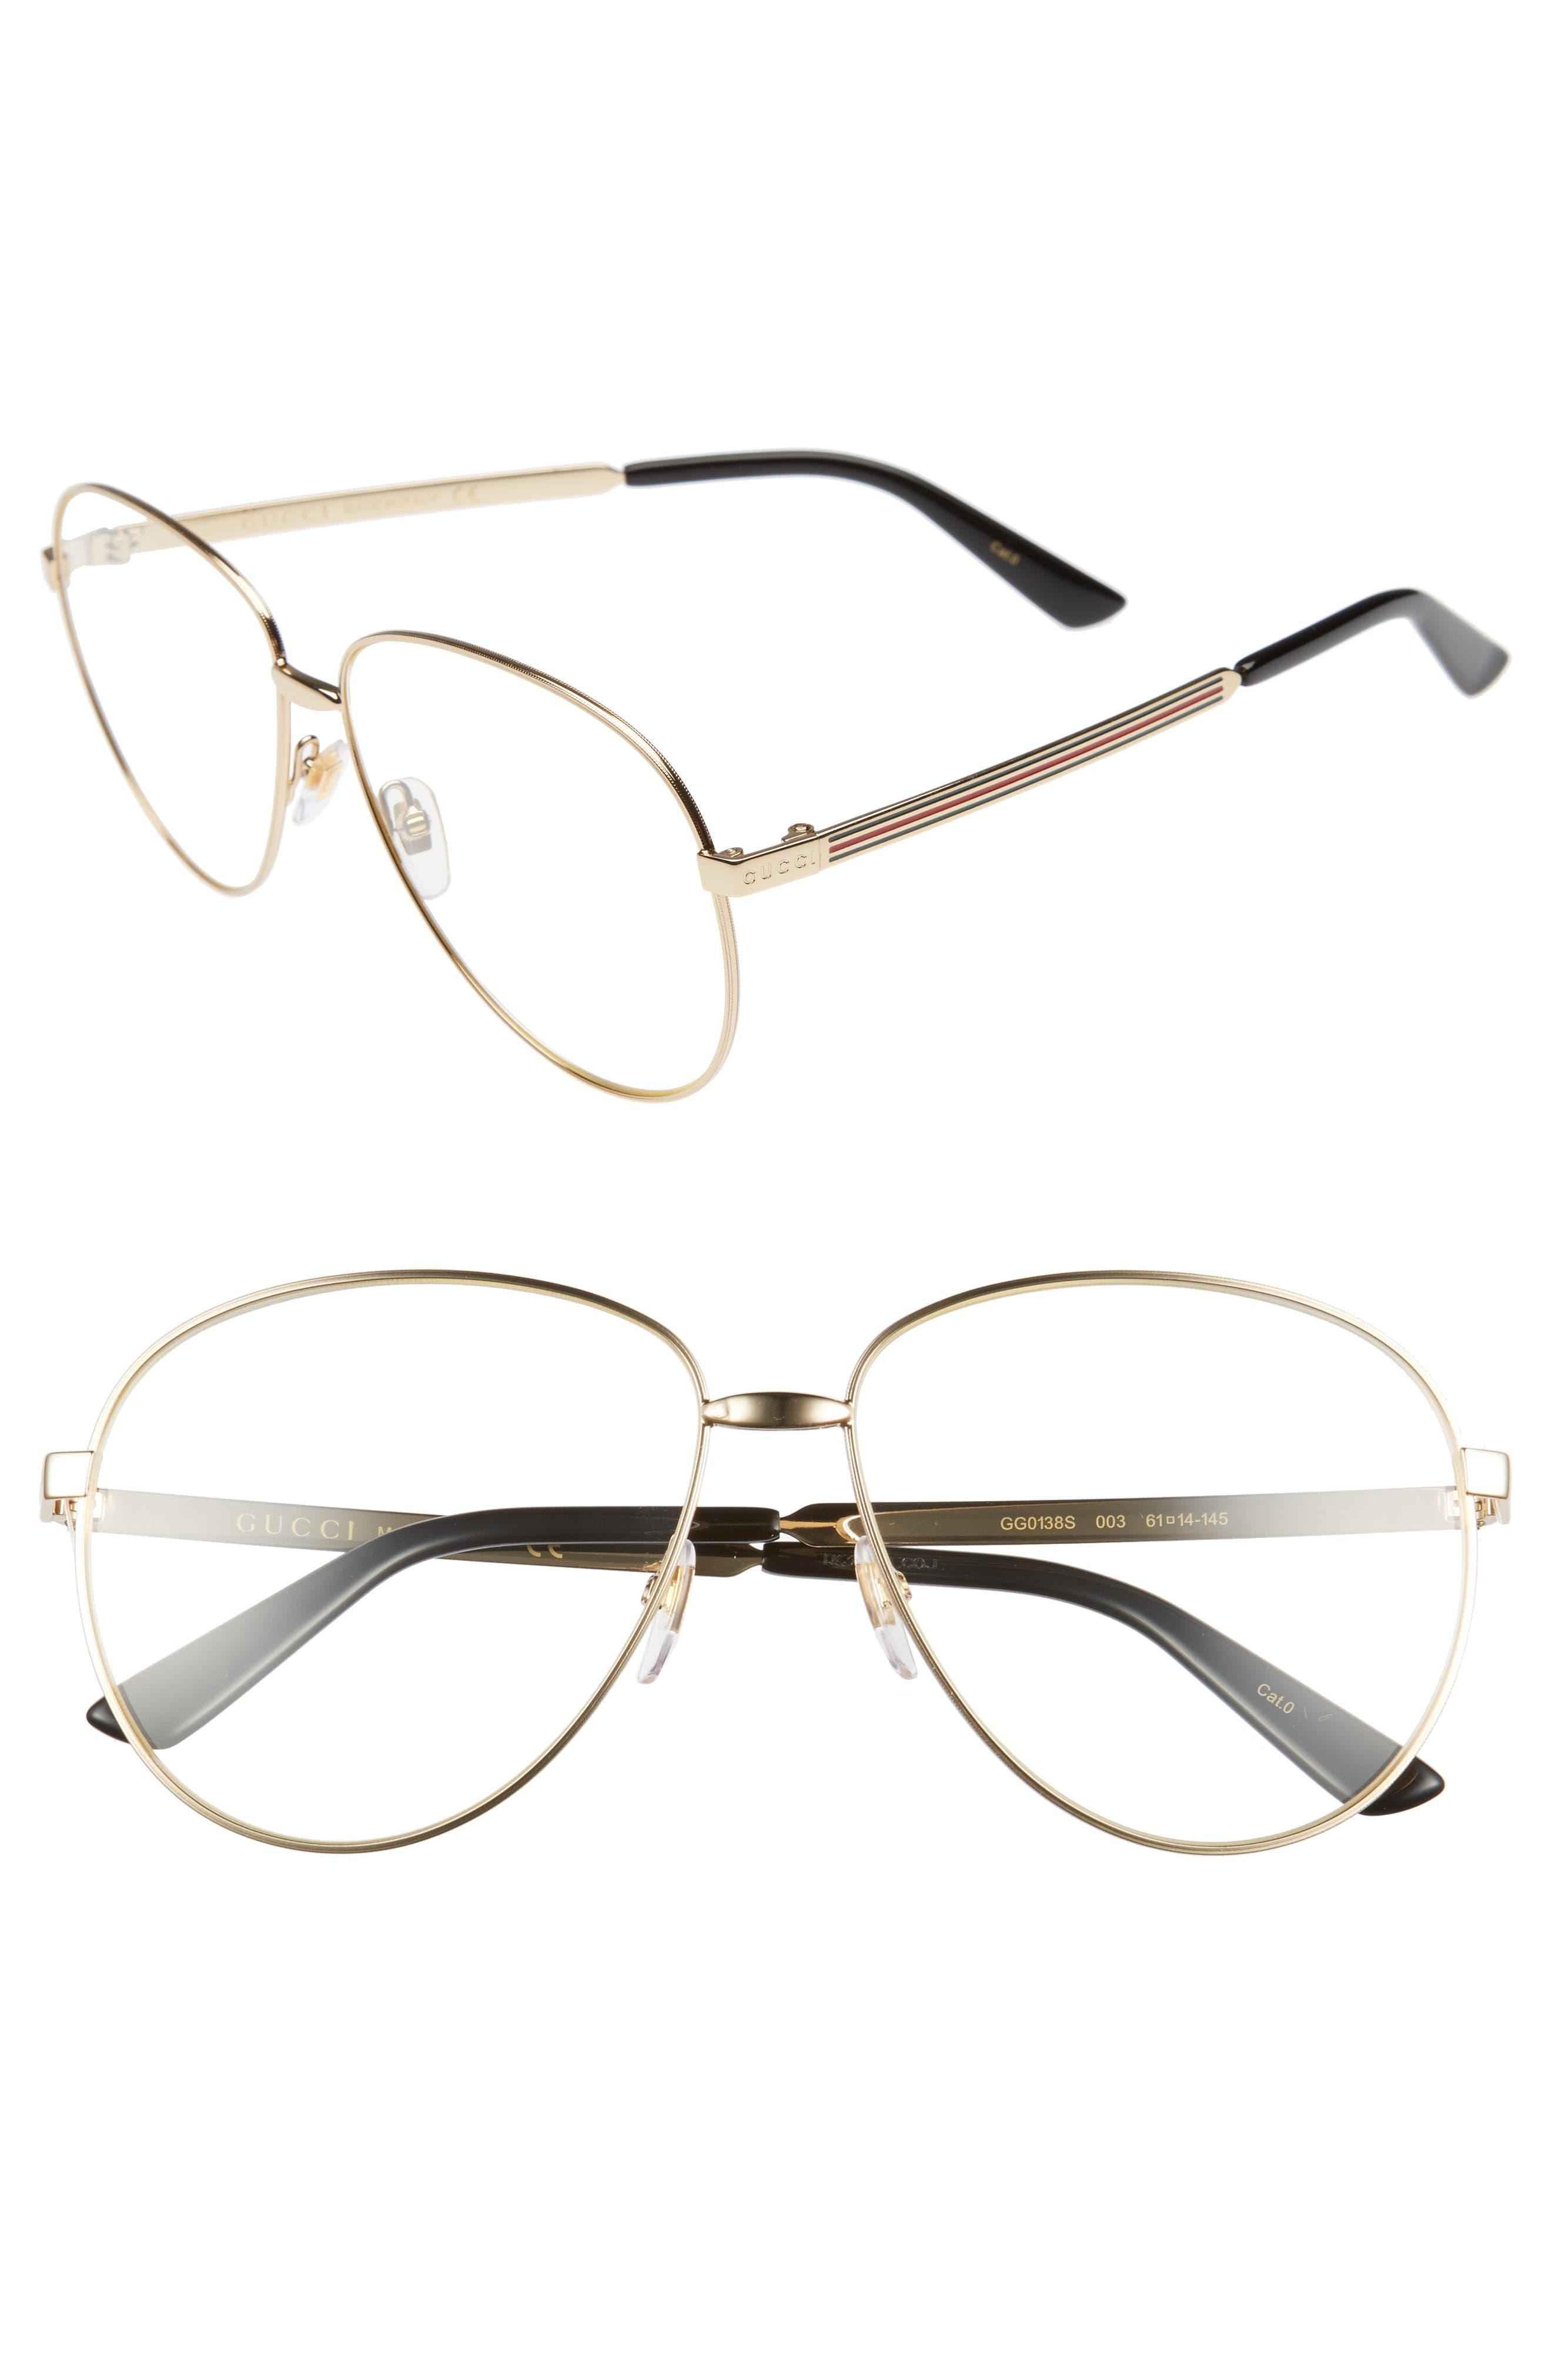 61mm Aviator Sunglasses,                             Main thumbnail 1, color,                             YELLOW ENDURA GOLD